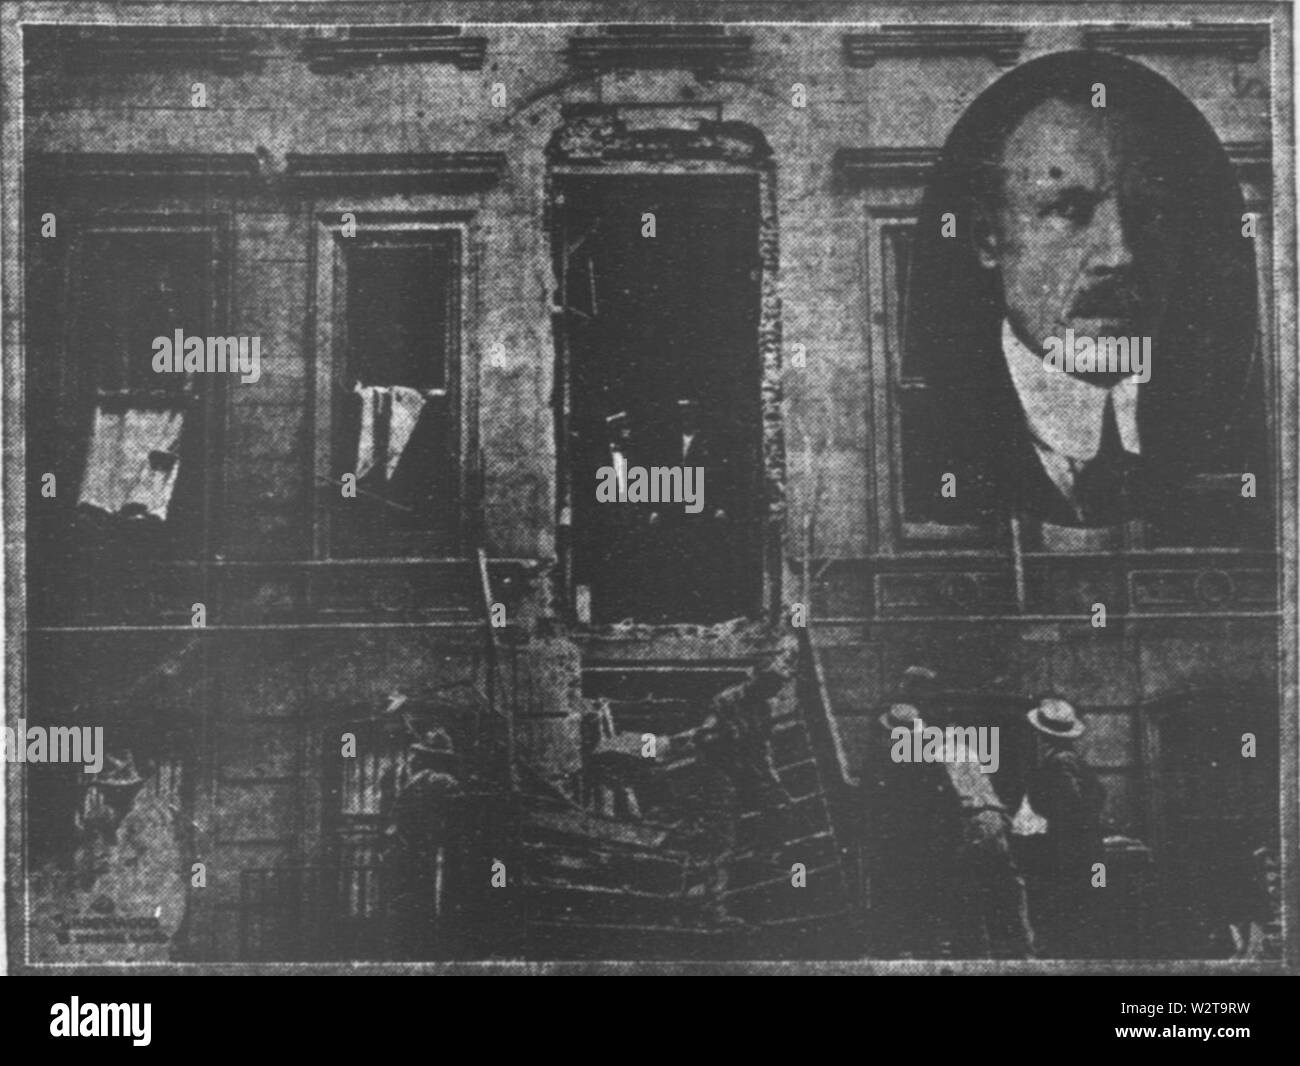 Demolished home of home of Judge Charles C Nott JR New York Bolshevist bomb plot 1919 - Stock Image